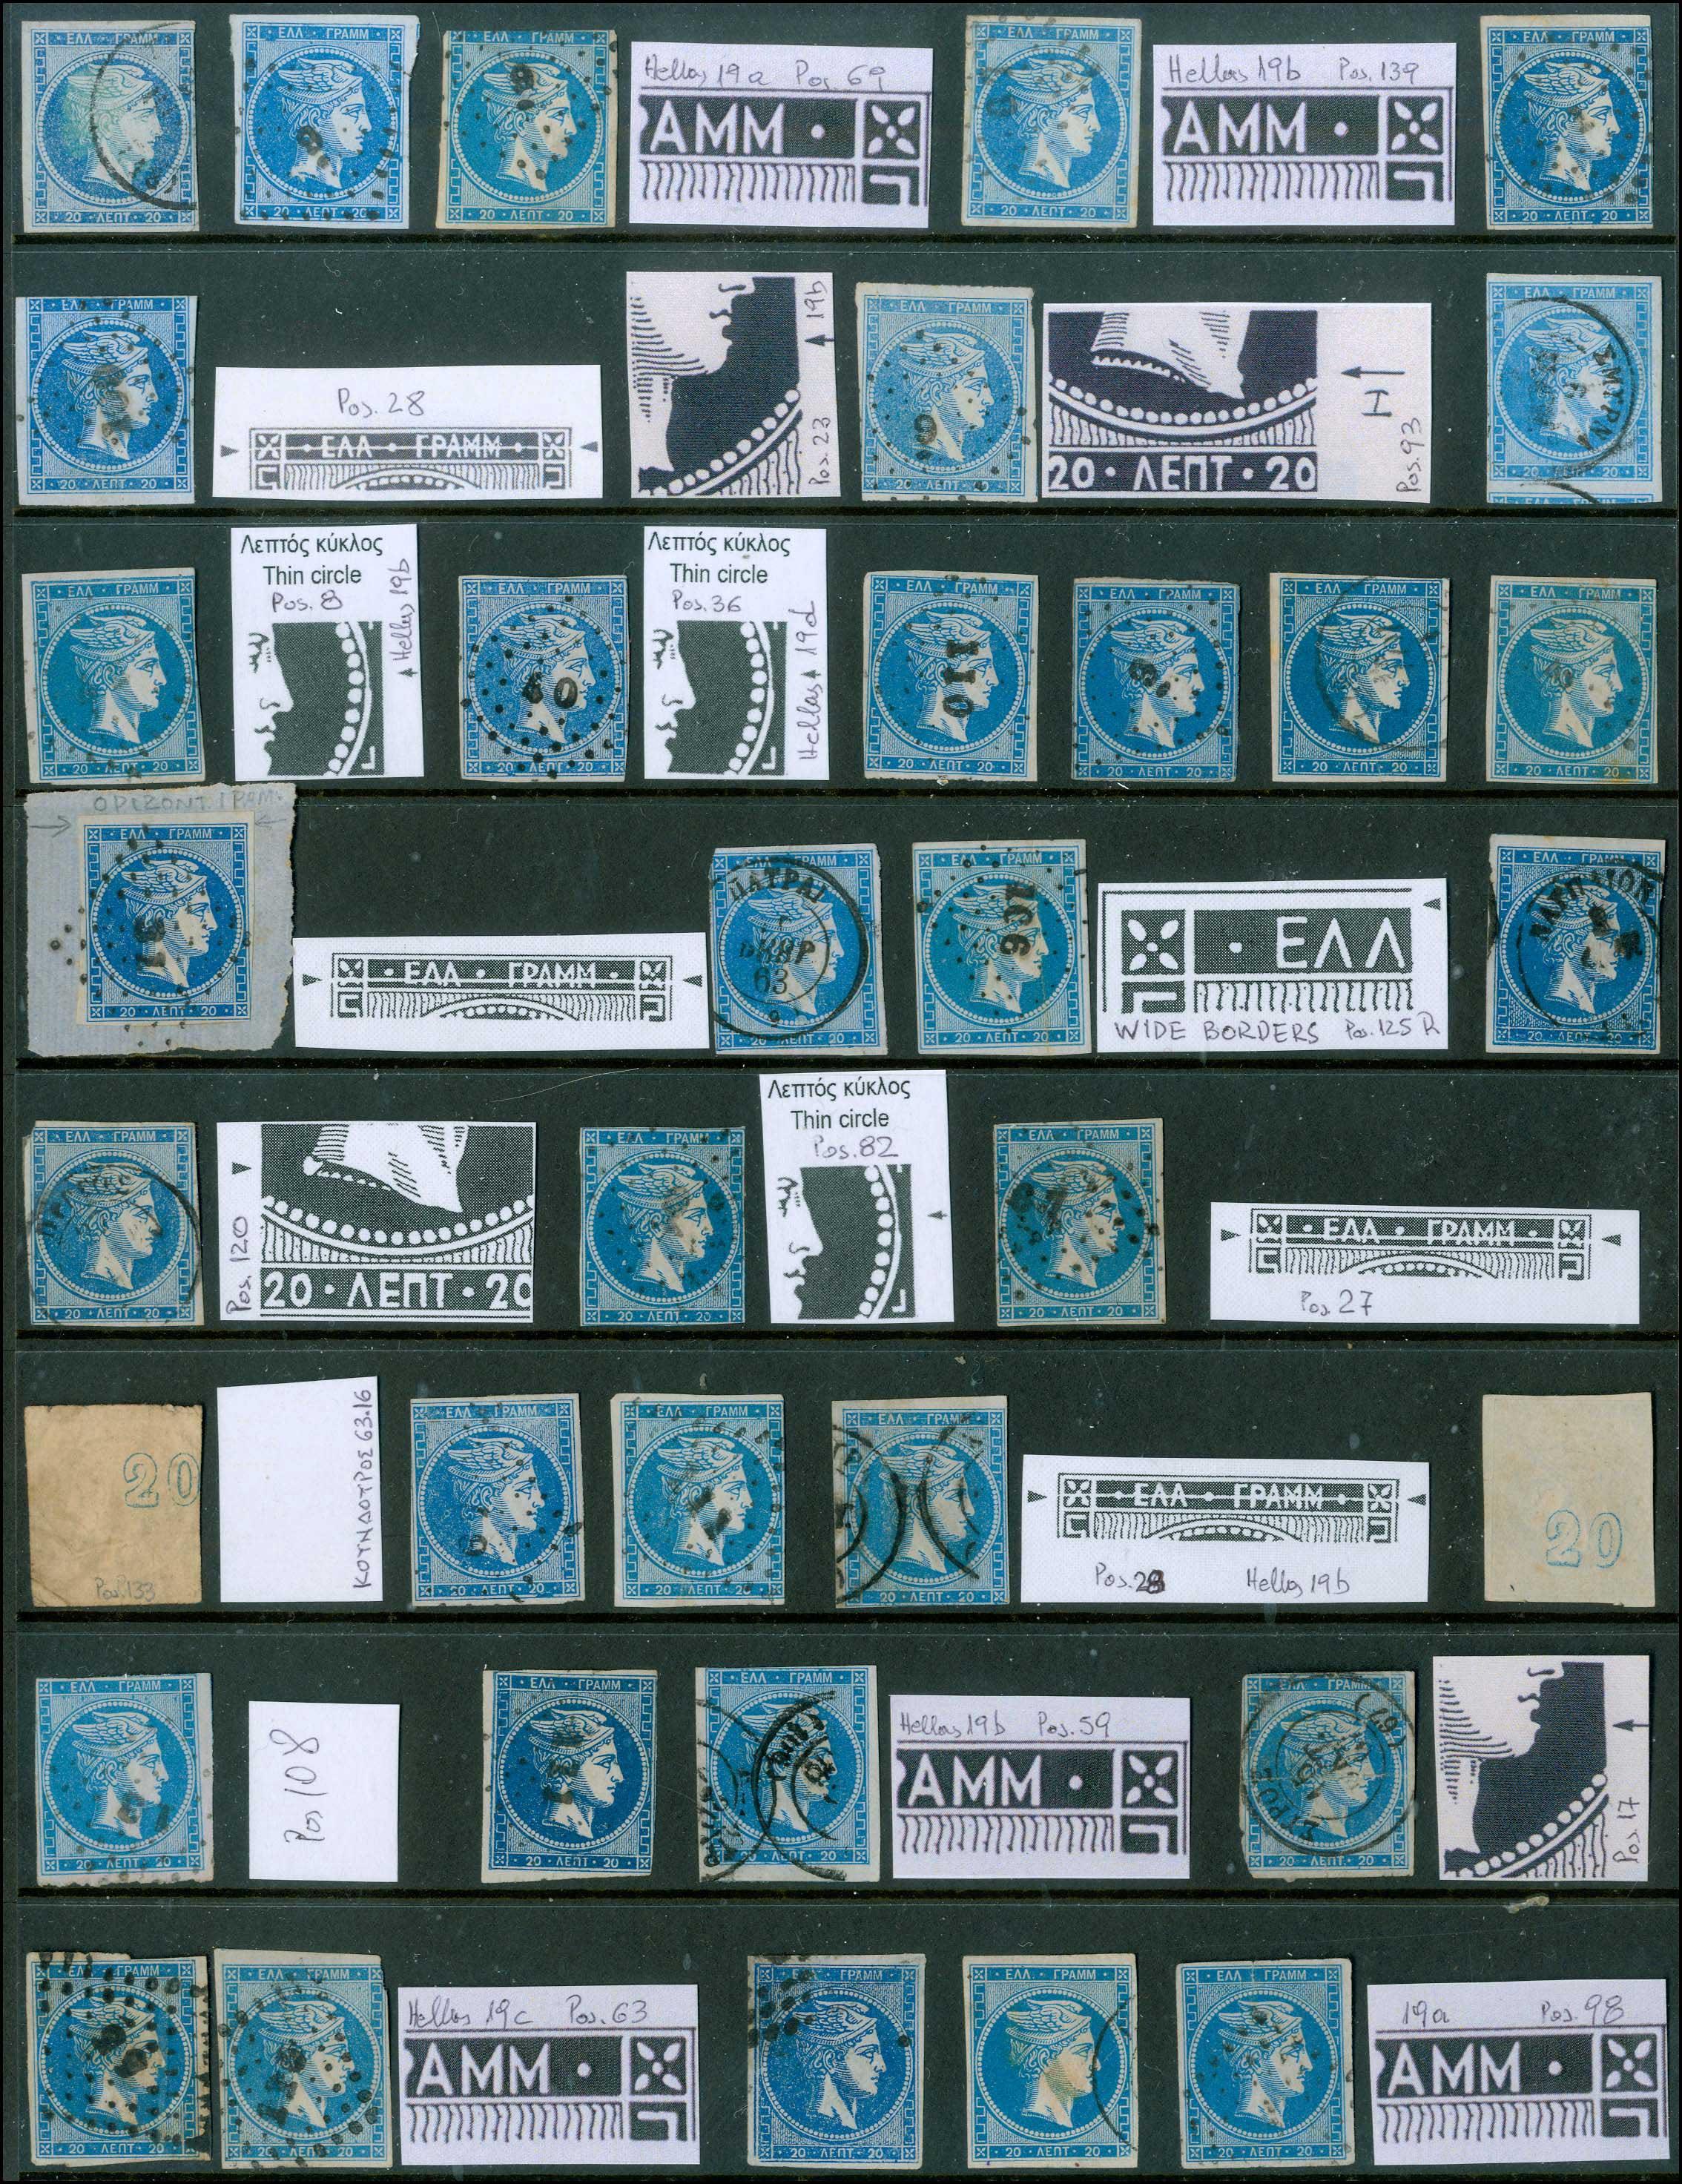 Lot 1 - -  LARGE HERMES HEAD large hermes head -  A. Karamitsos Public Auction 639 General Stamp Sale